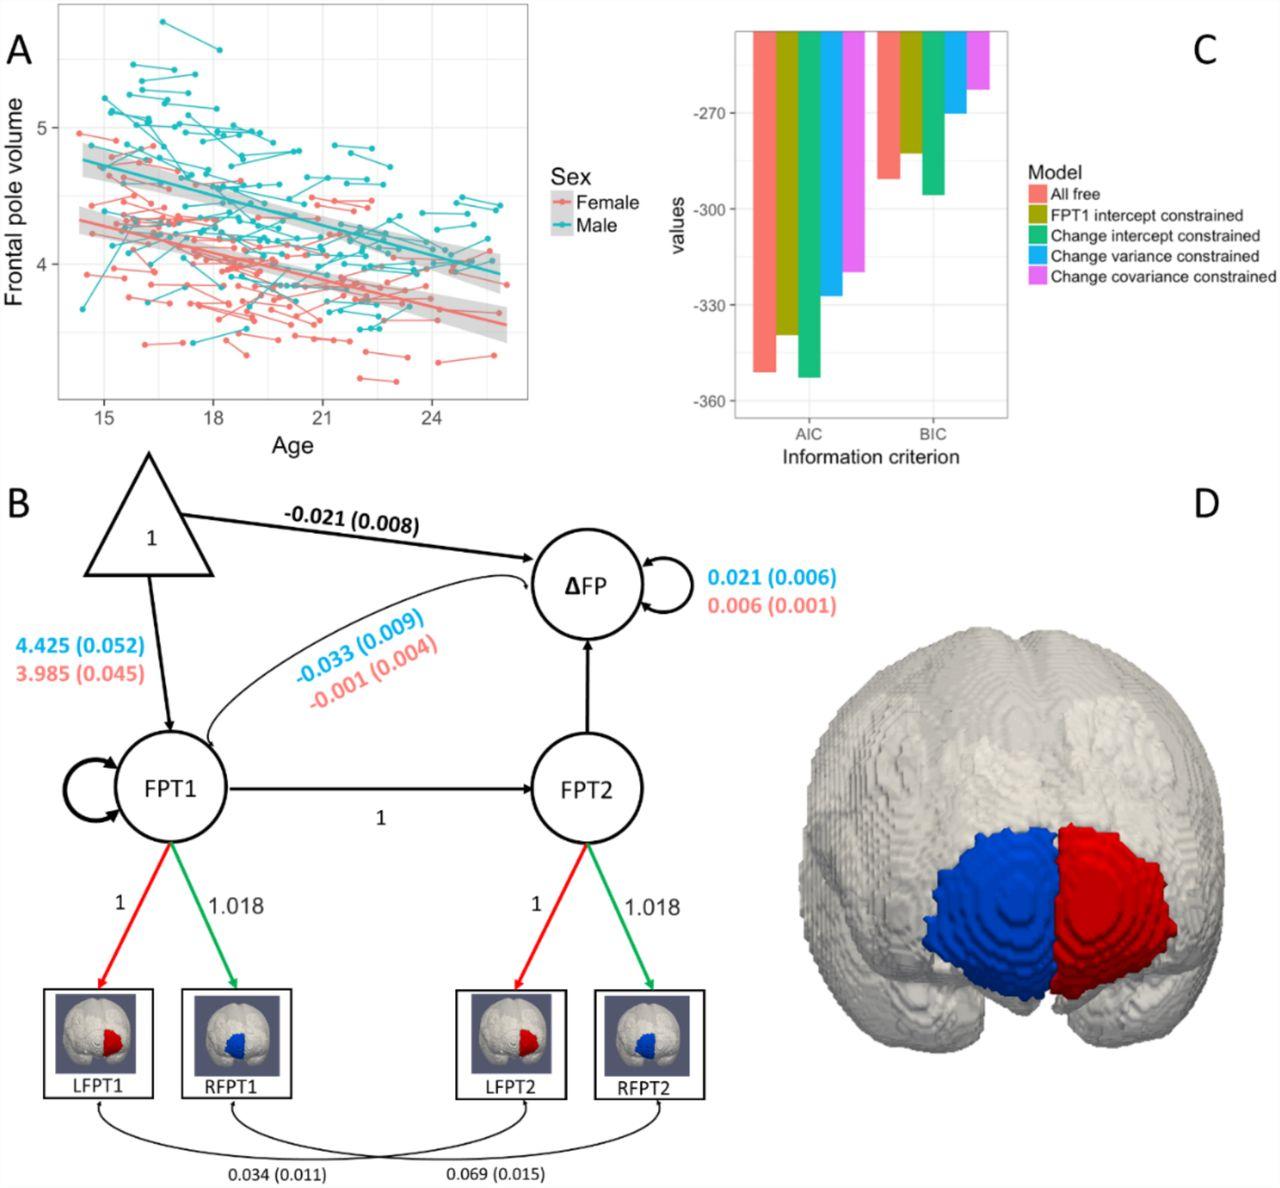 Developmental cognitive neuroscience using Latent Change